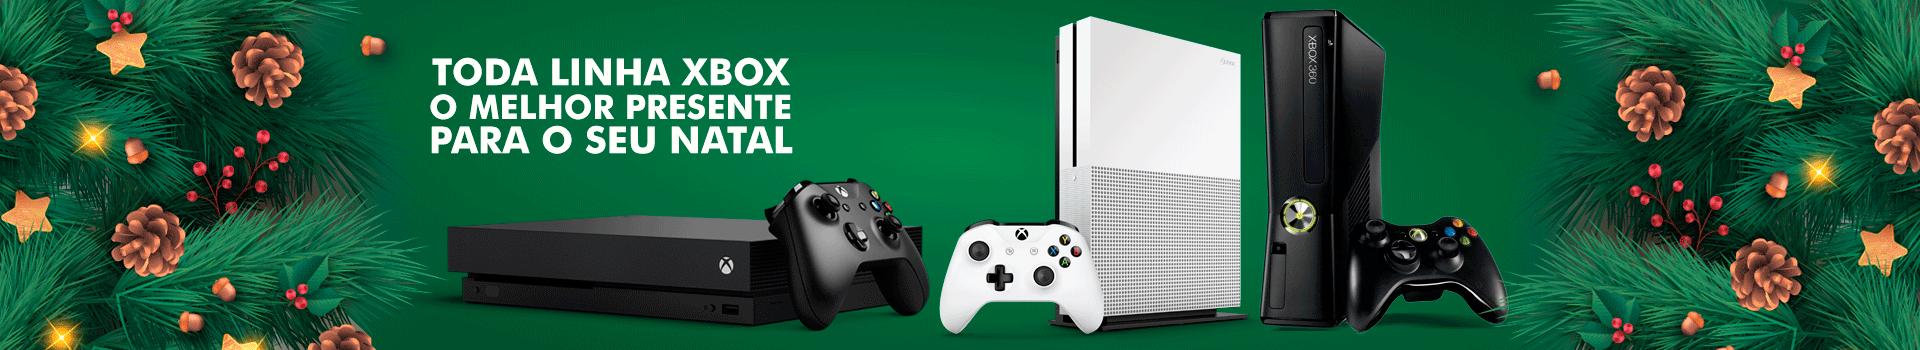 Xbox One / S / X